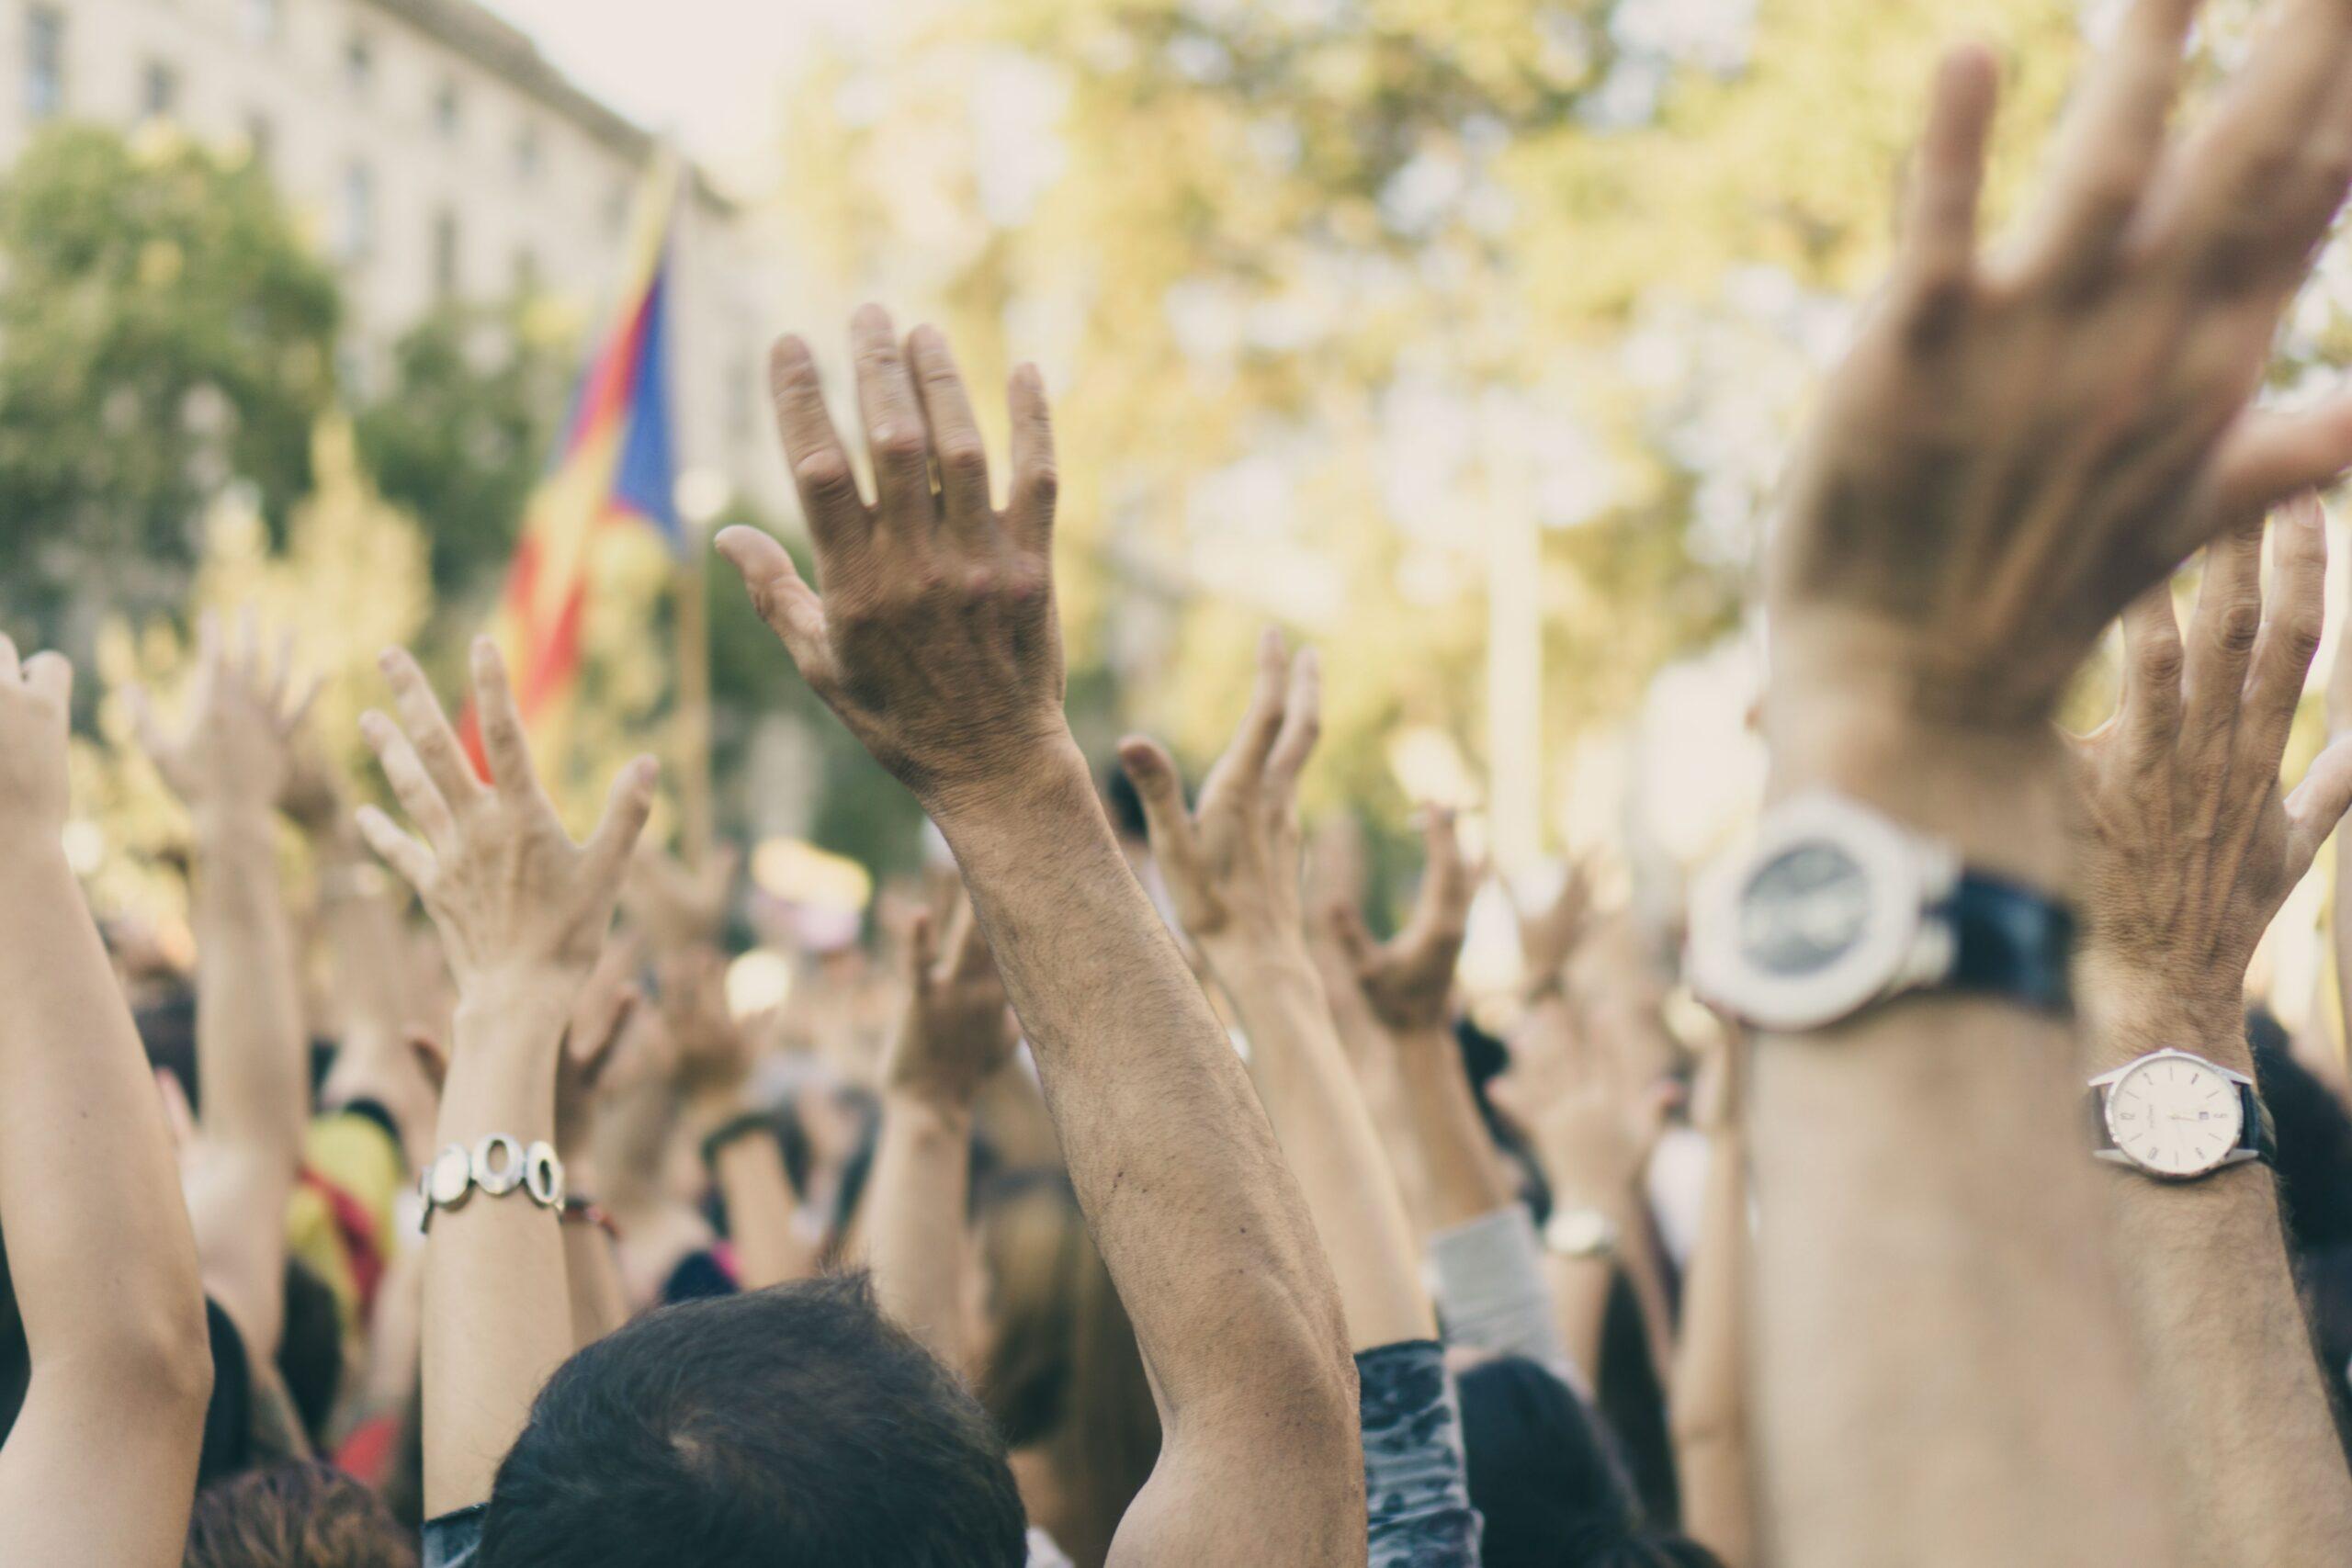 Alerter mobilisation manifestation revendication démocratie